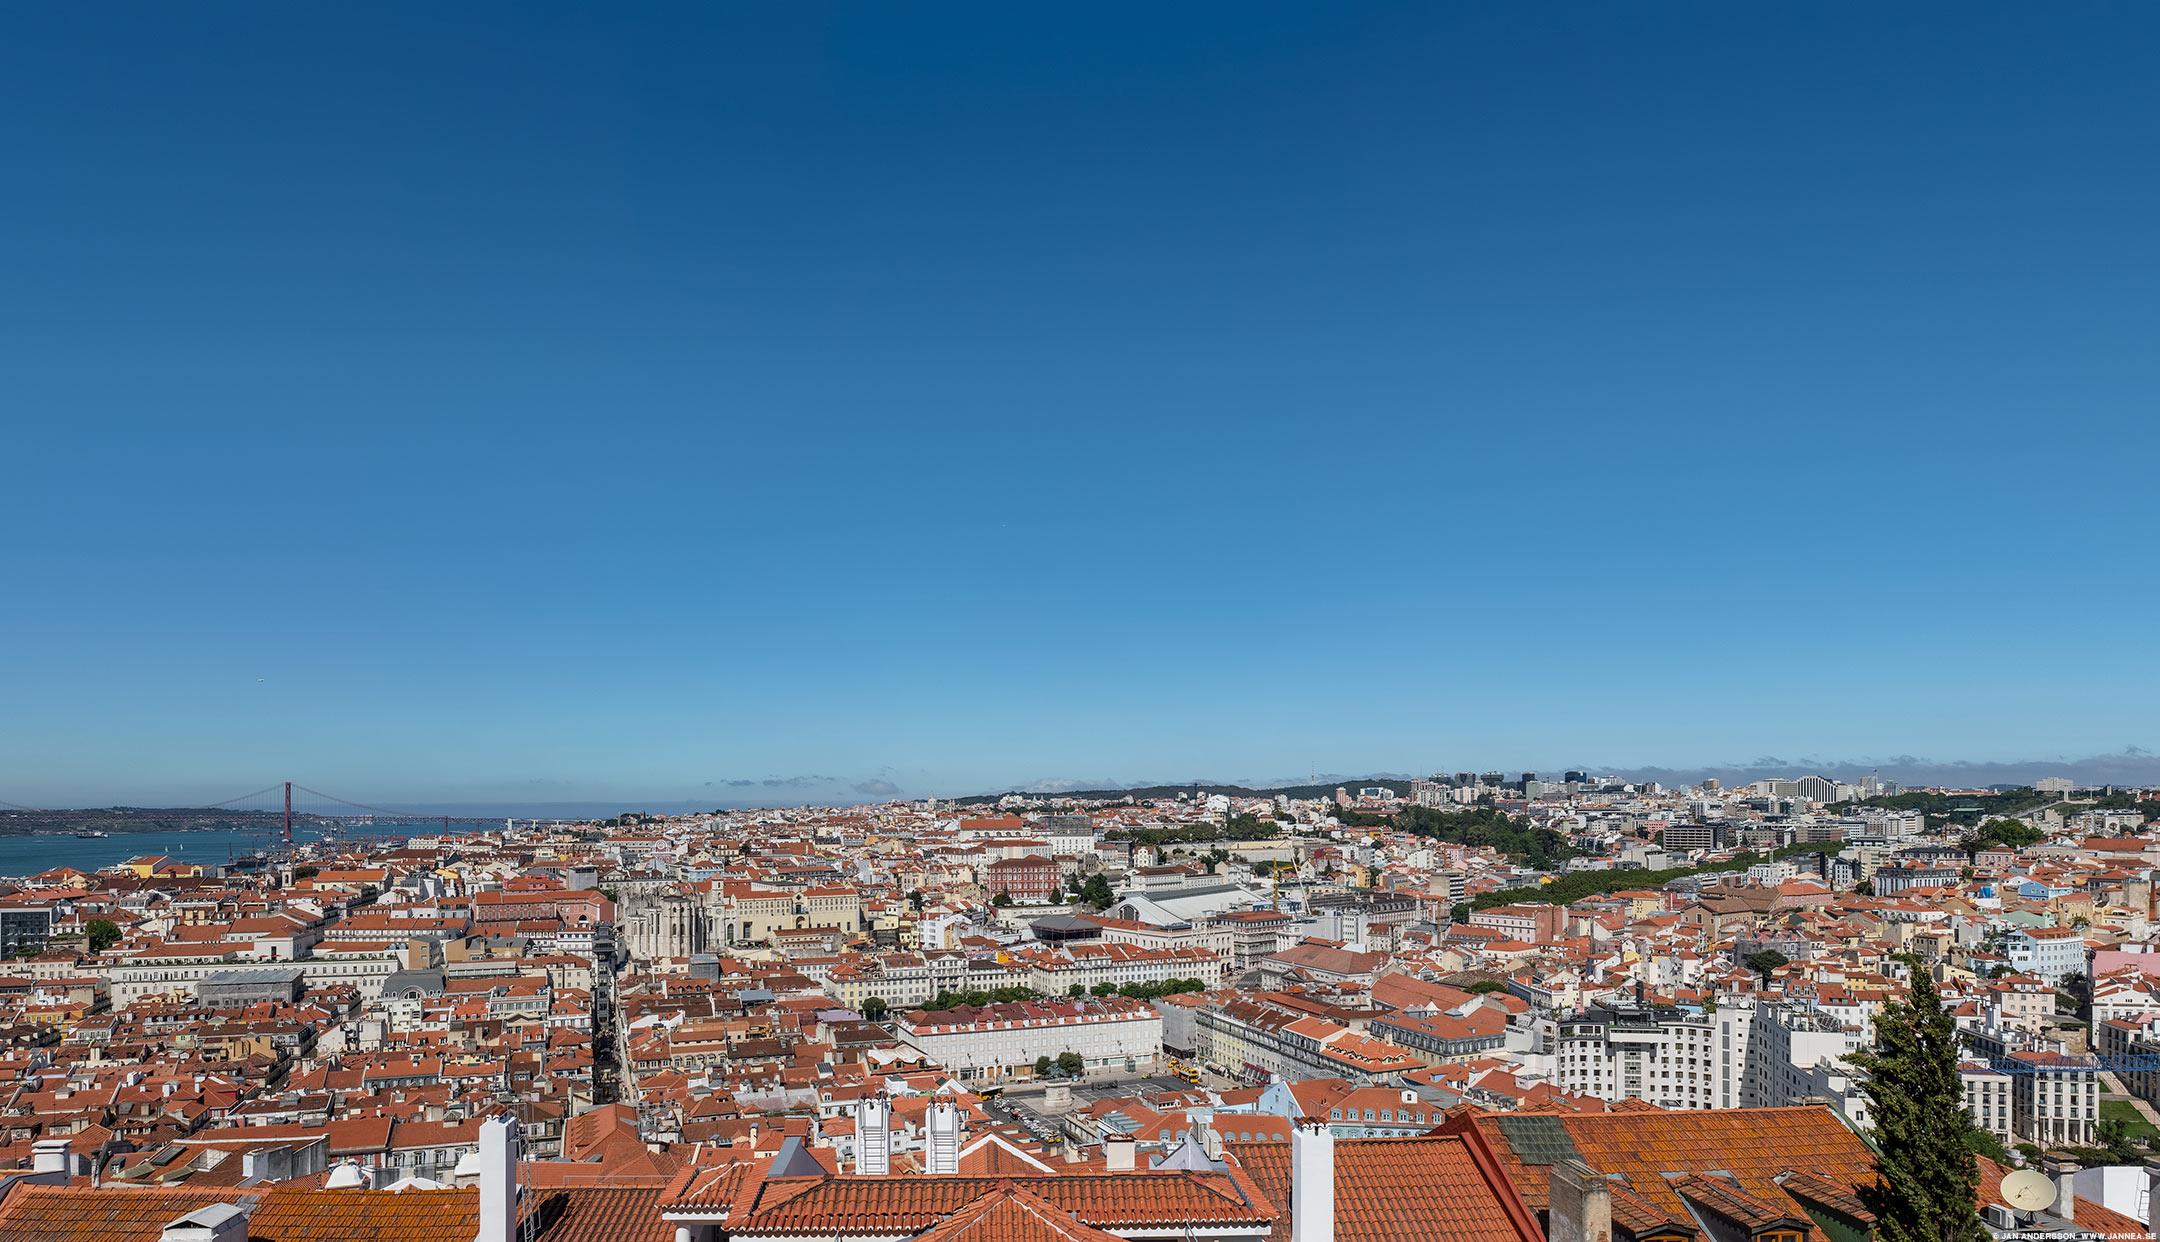 Panorama över Lissabon |© Jan Andersson